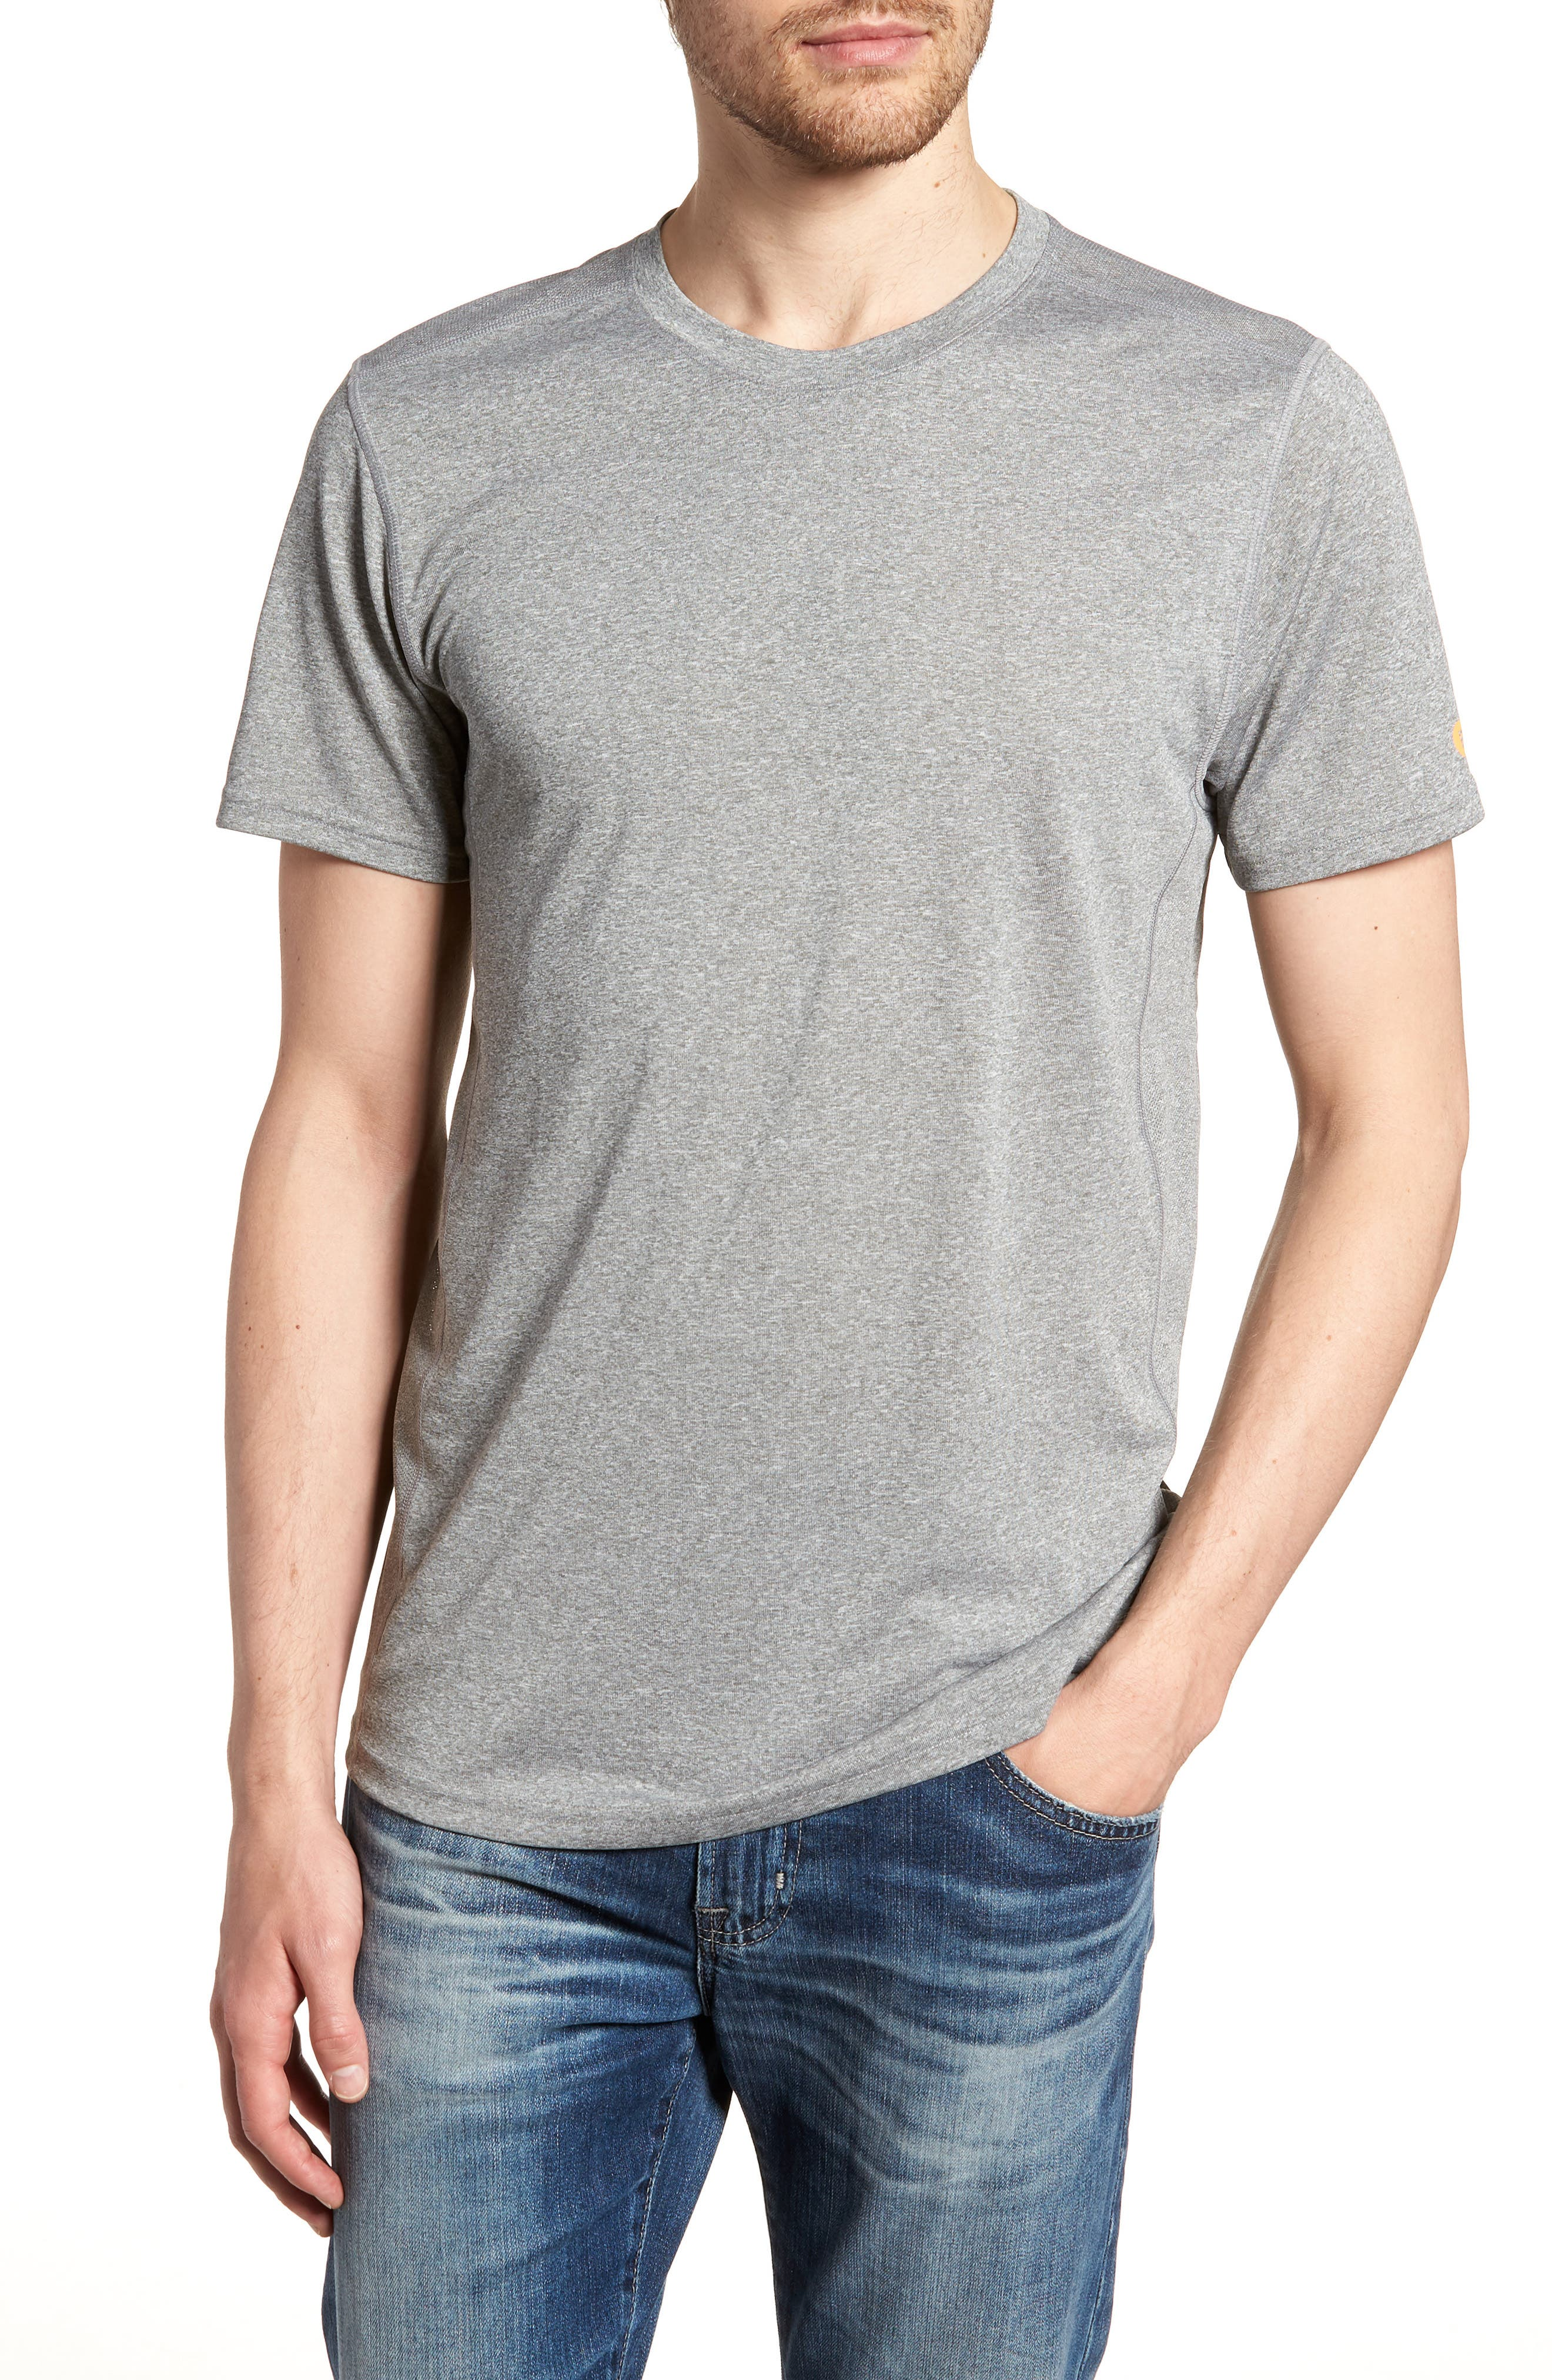 Goodsport Mesh Panel T-Shirt,                             Main thumbnail 3, color,